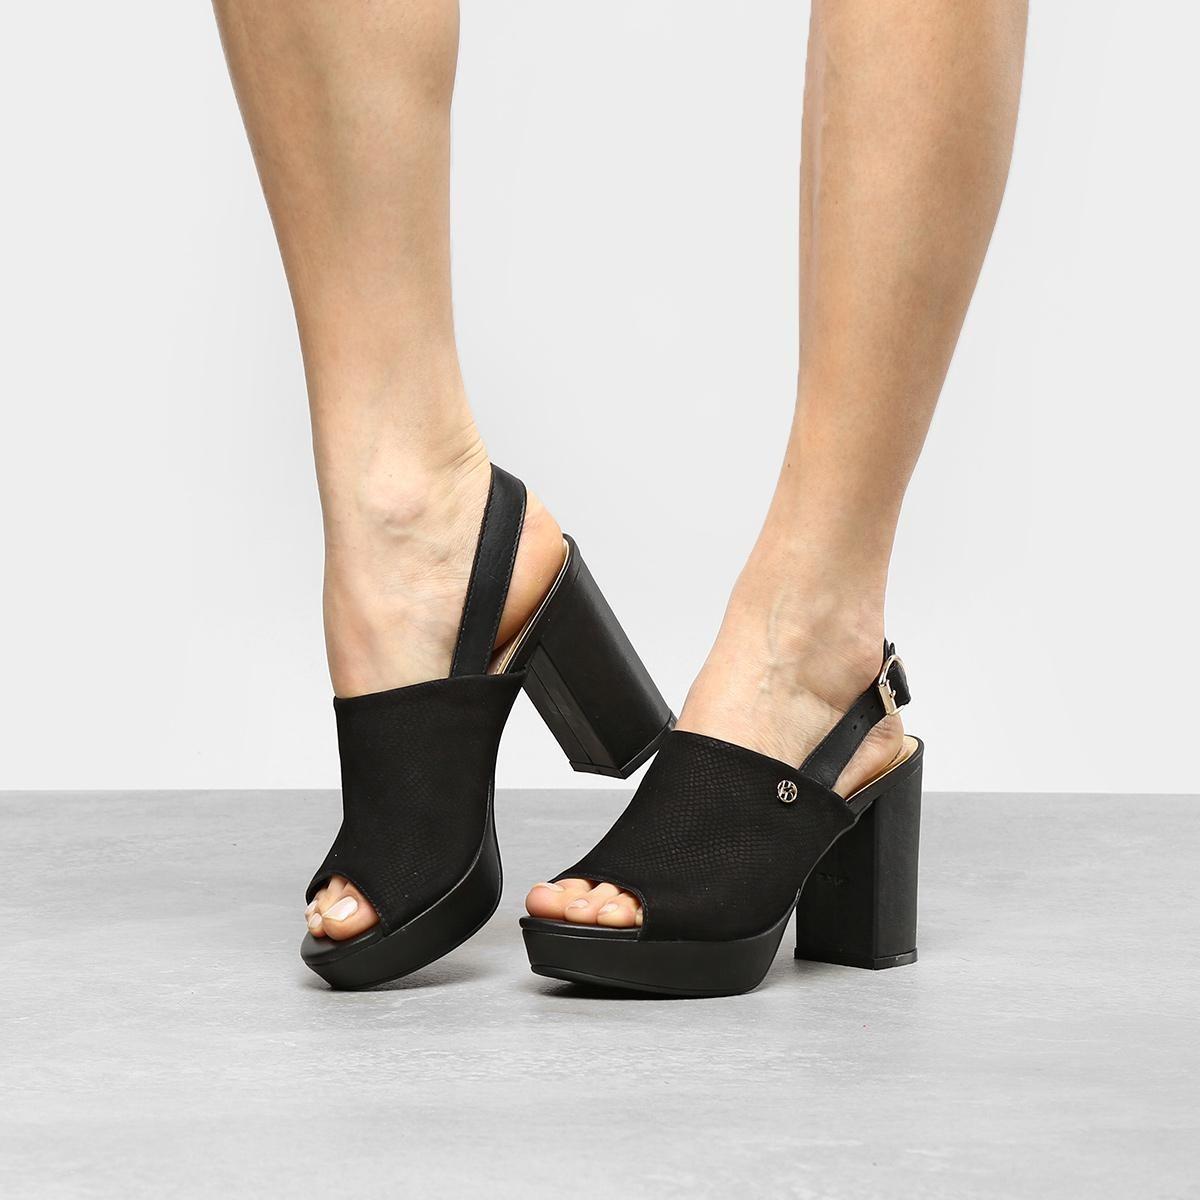 59e221fc02 sandália couro bottero meia pata cobra feminina. Carregando zoom.